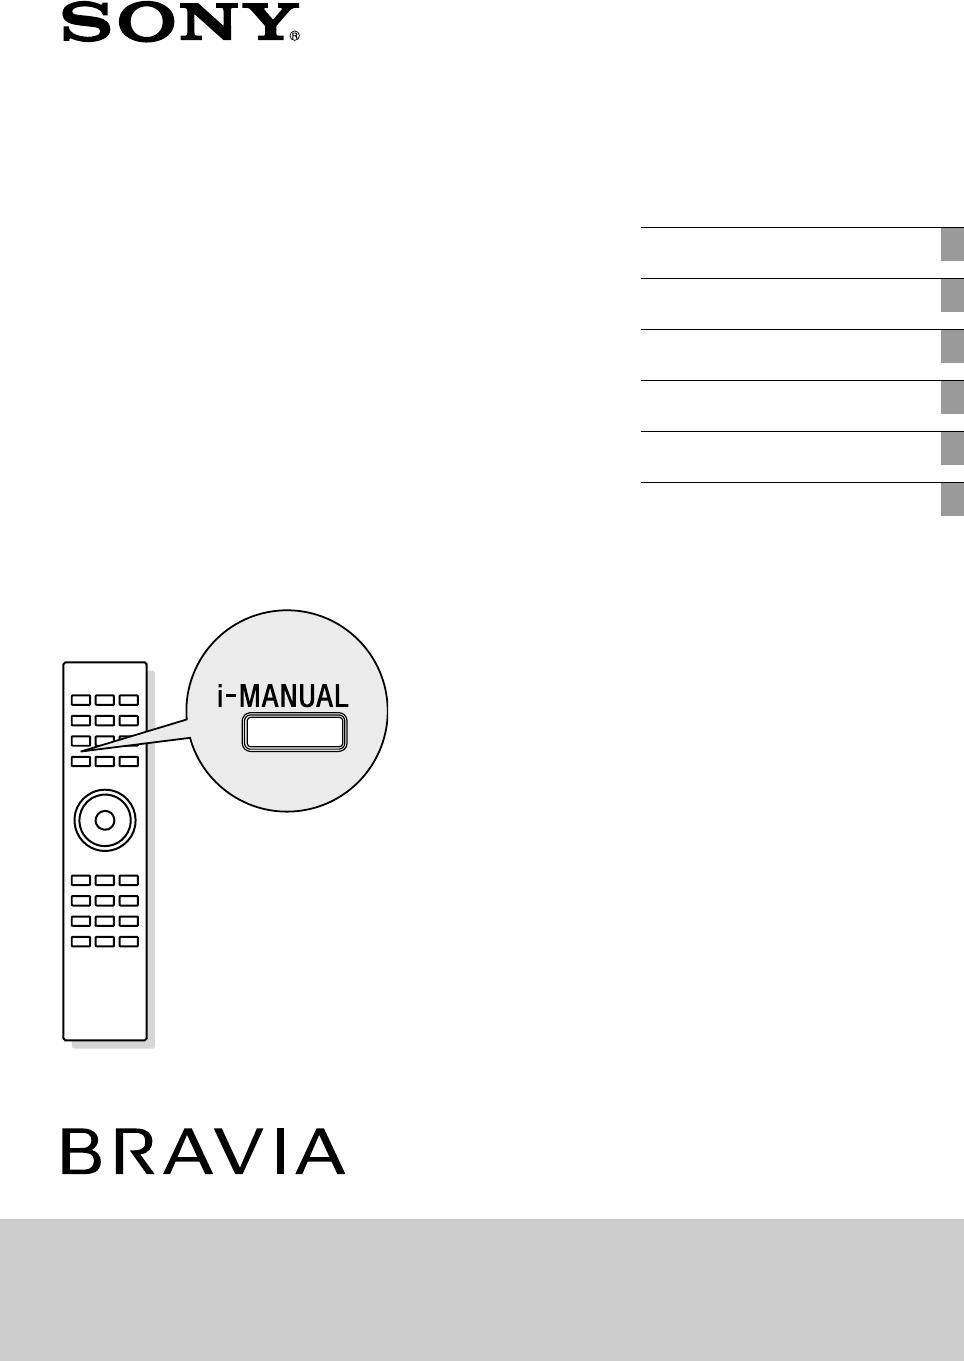 Handleiding Sony KDL-40EX71x (pagina 1 van 104) (Deutsch